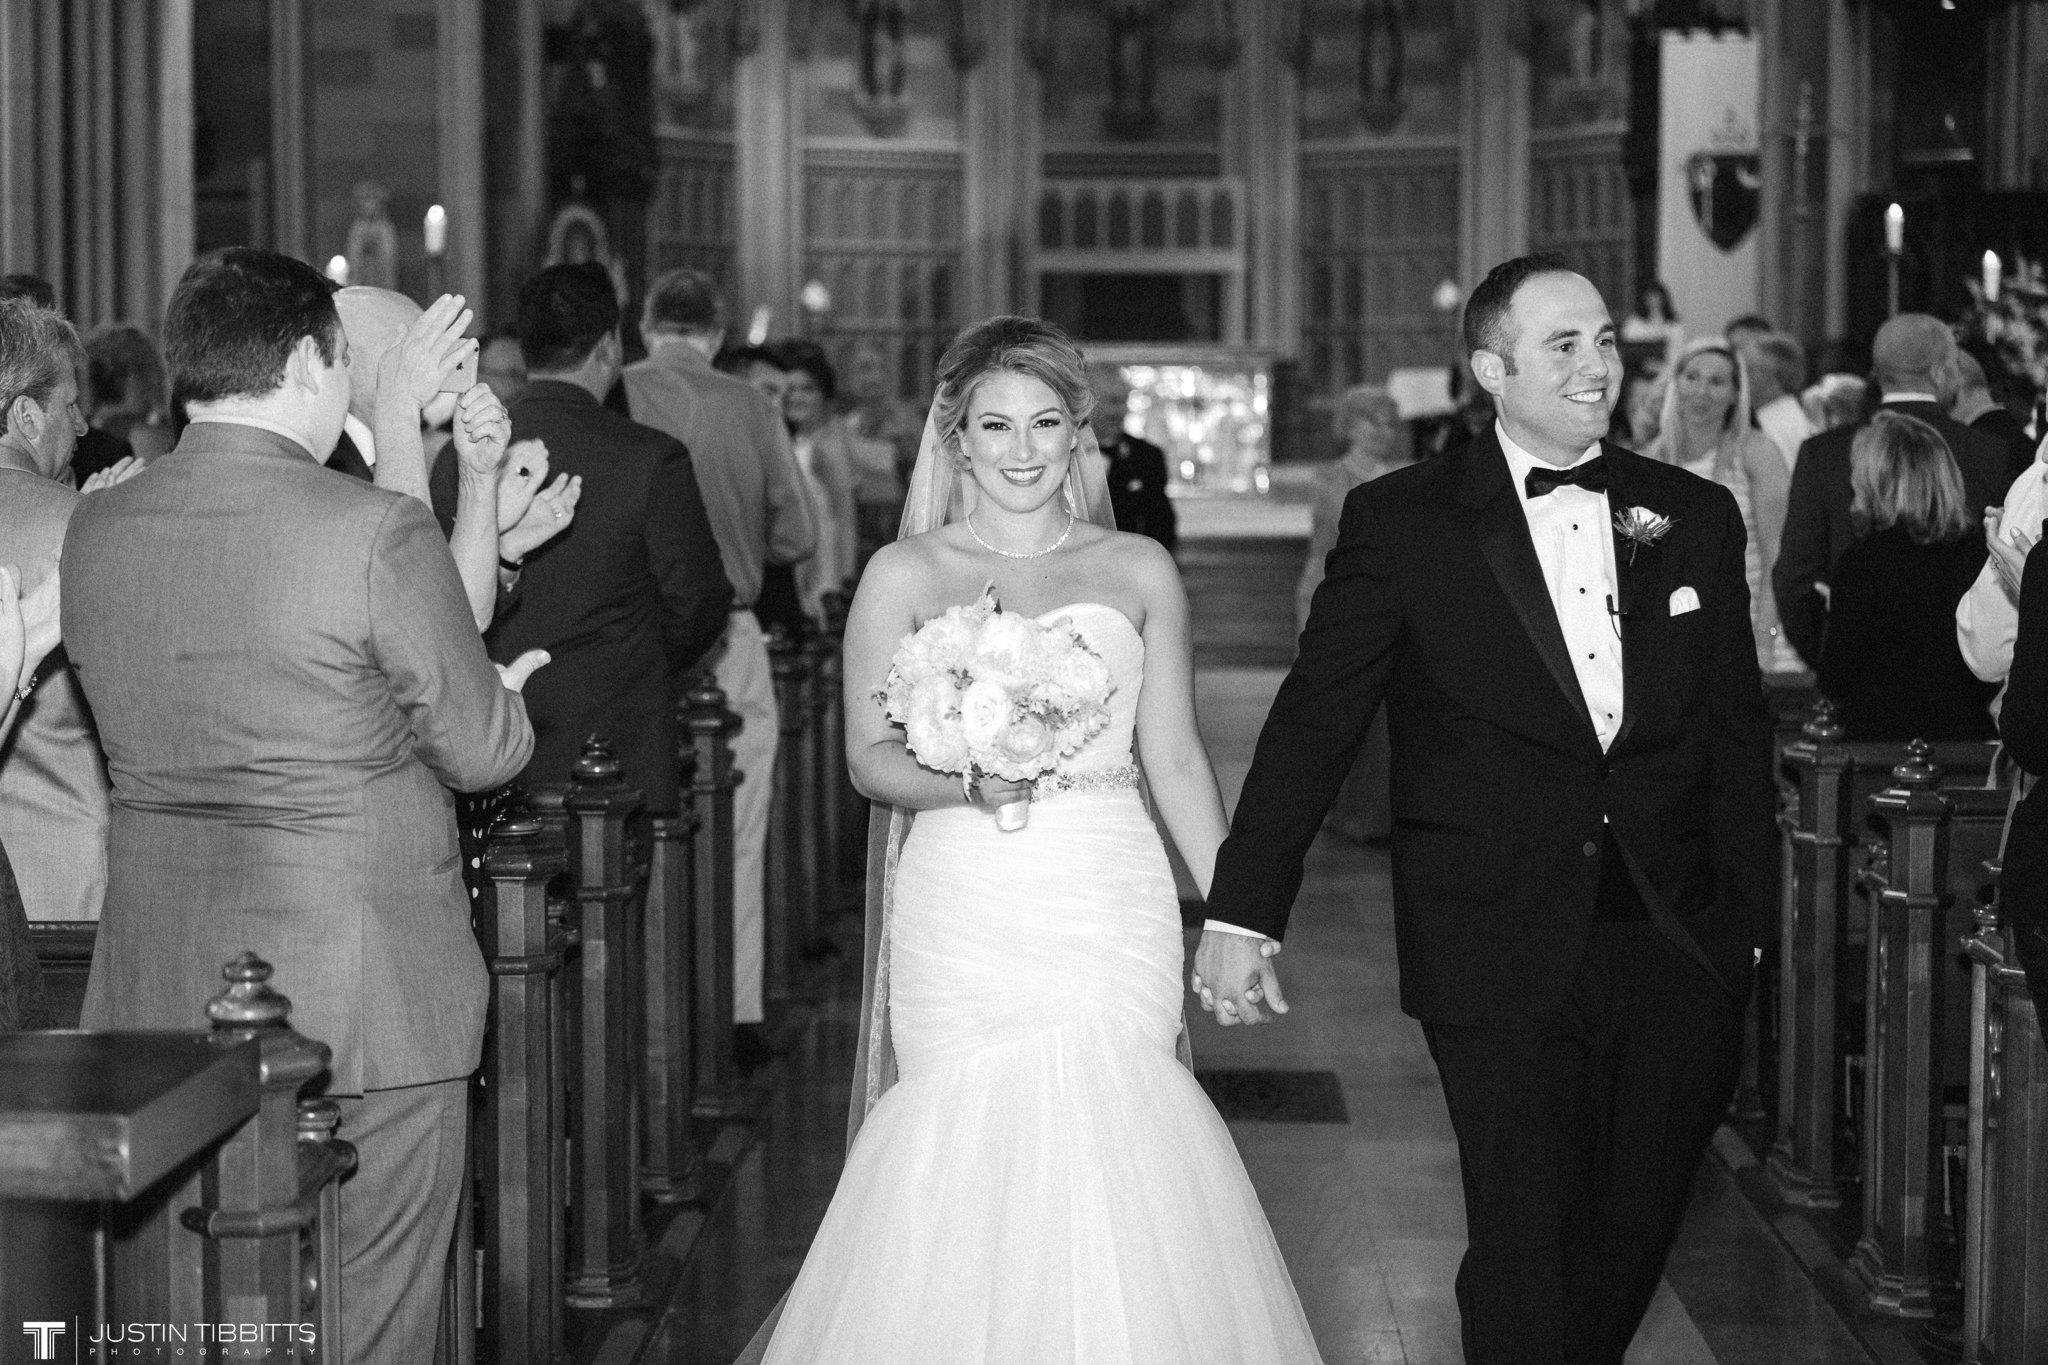 state-room-wedding-photos-with-amanda-and-nick_0101